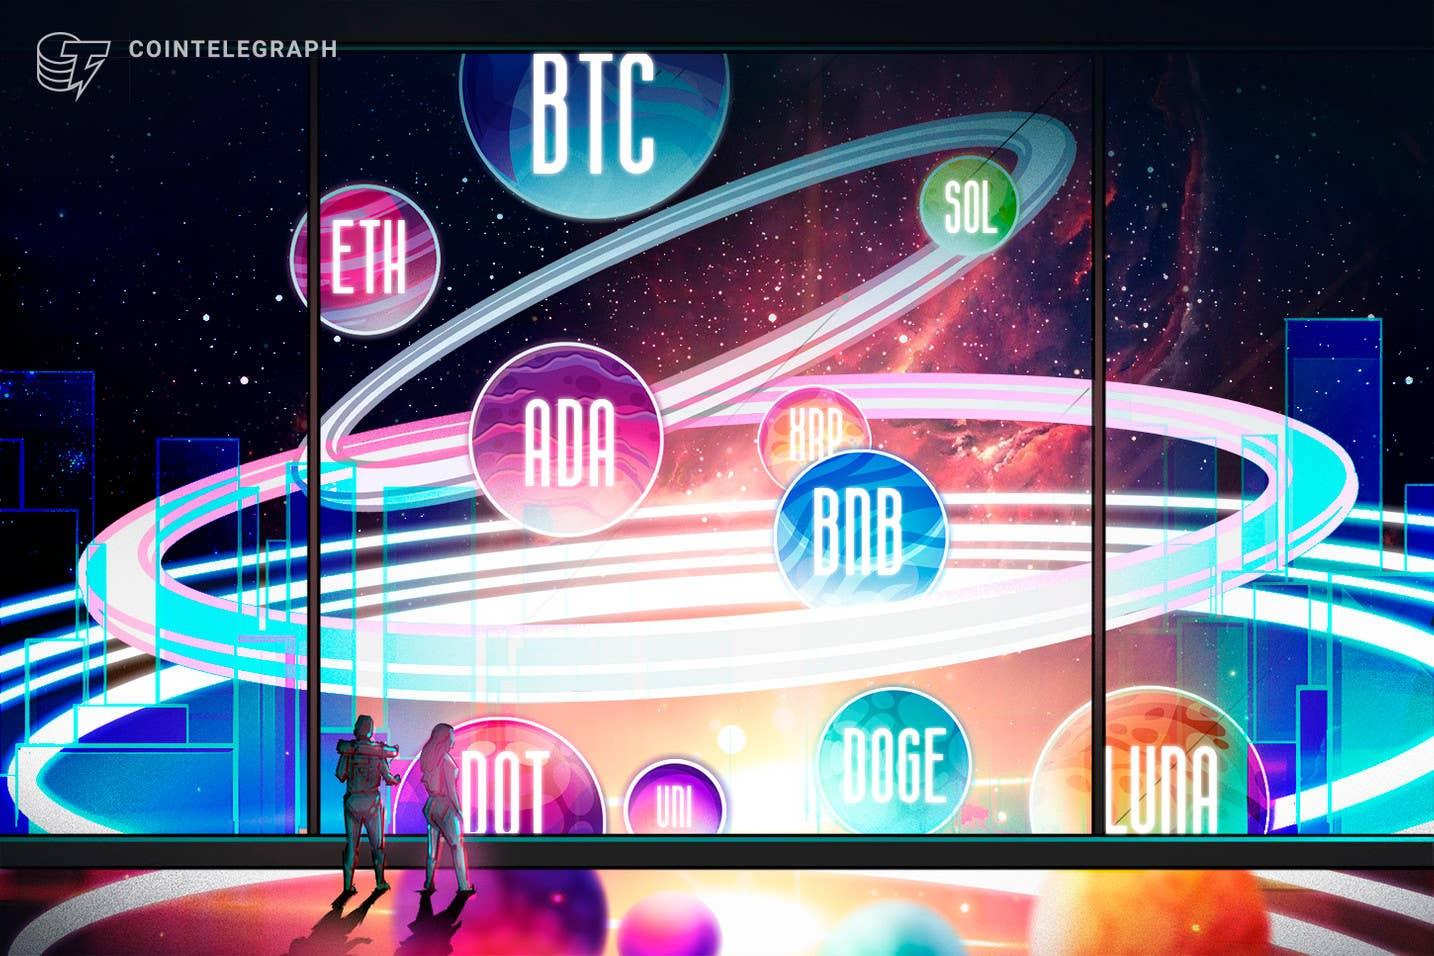 Kainų analizė 9/15: BTC, ETH, ADA, BNB, XRP, SOL, DOT, DOGE, UNI, LUNA